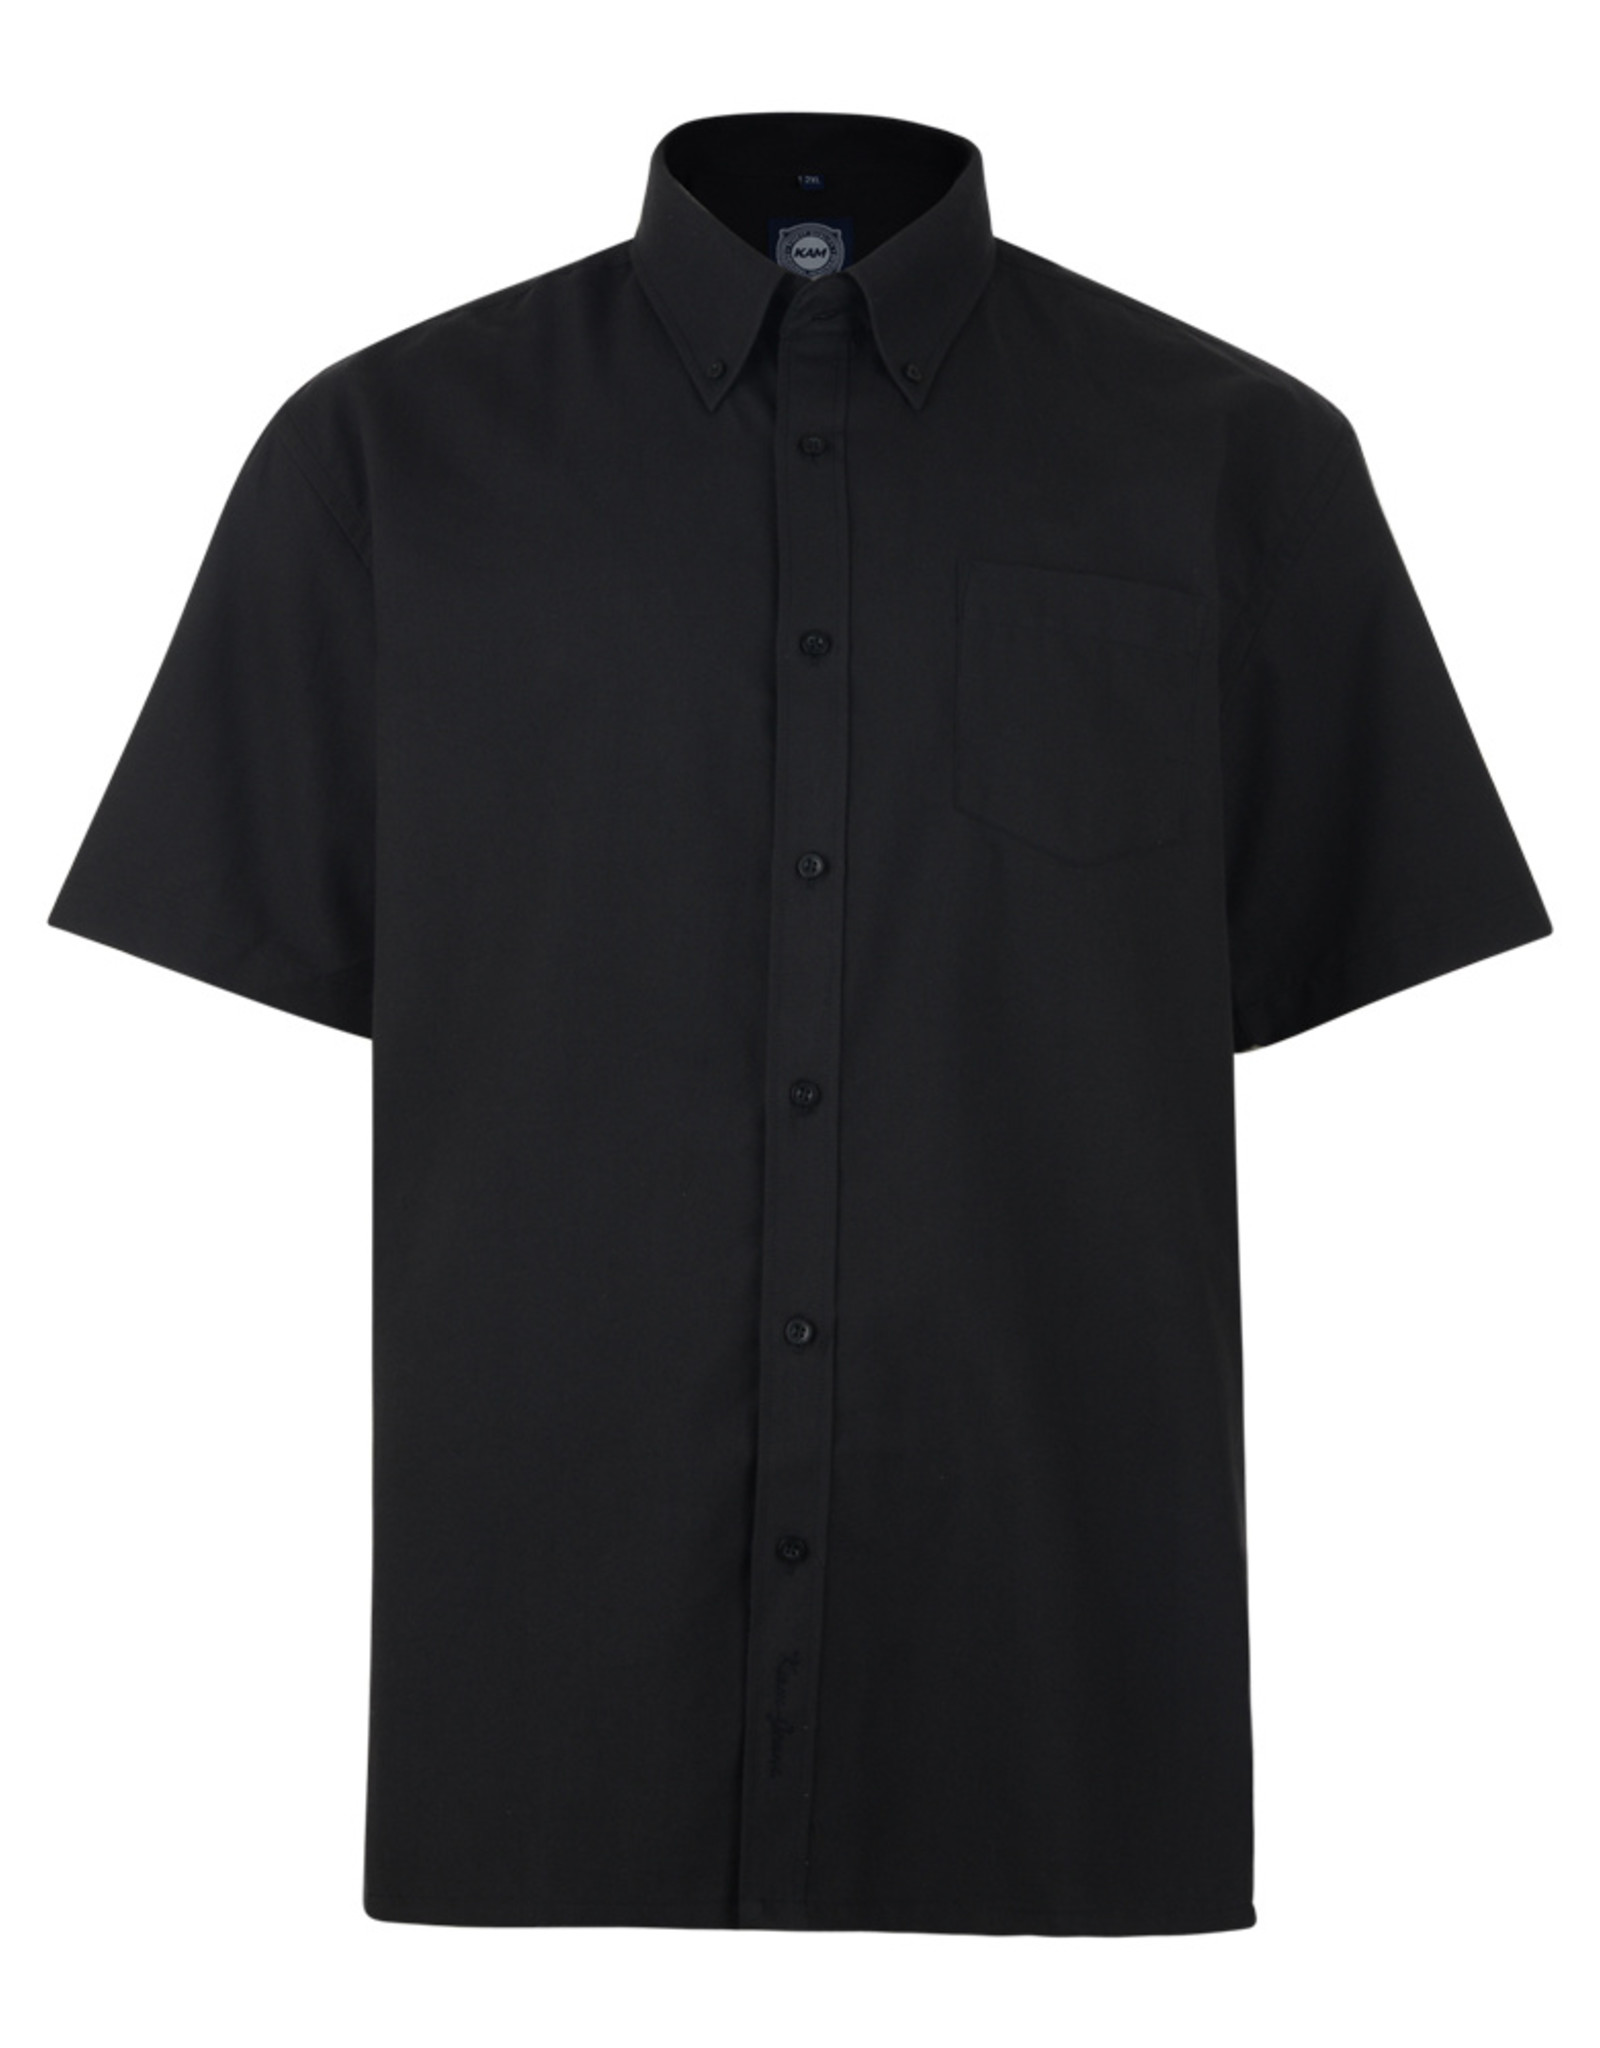 Kam Jeans OVERHEMD Oxford casual korte mouw zwart